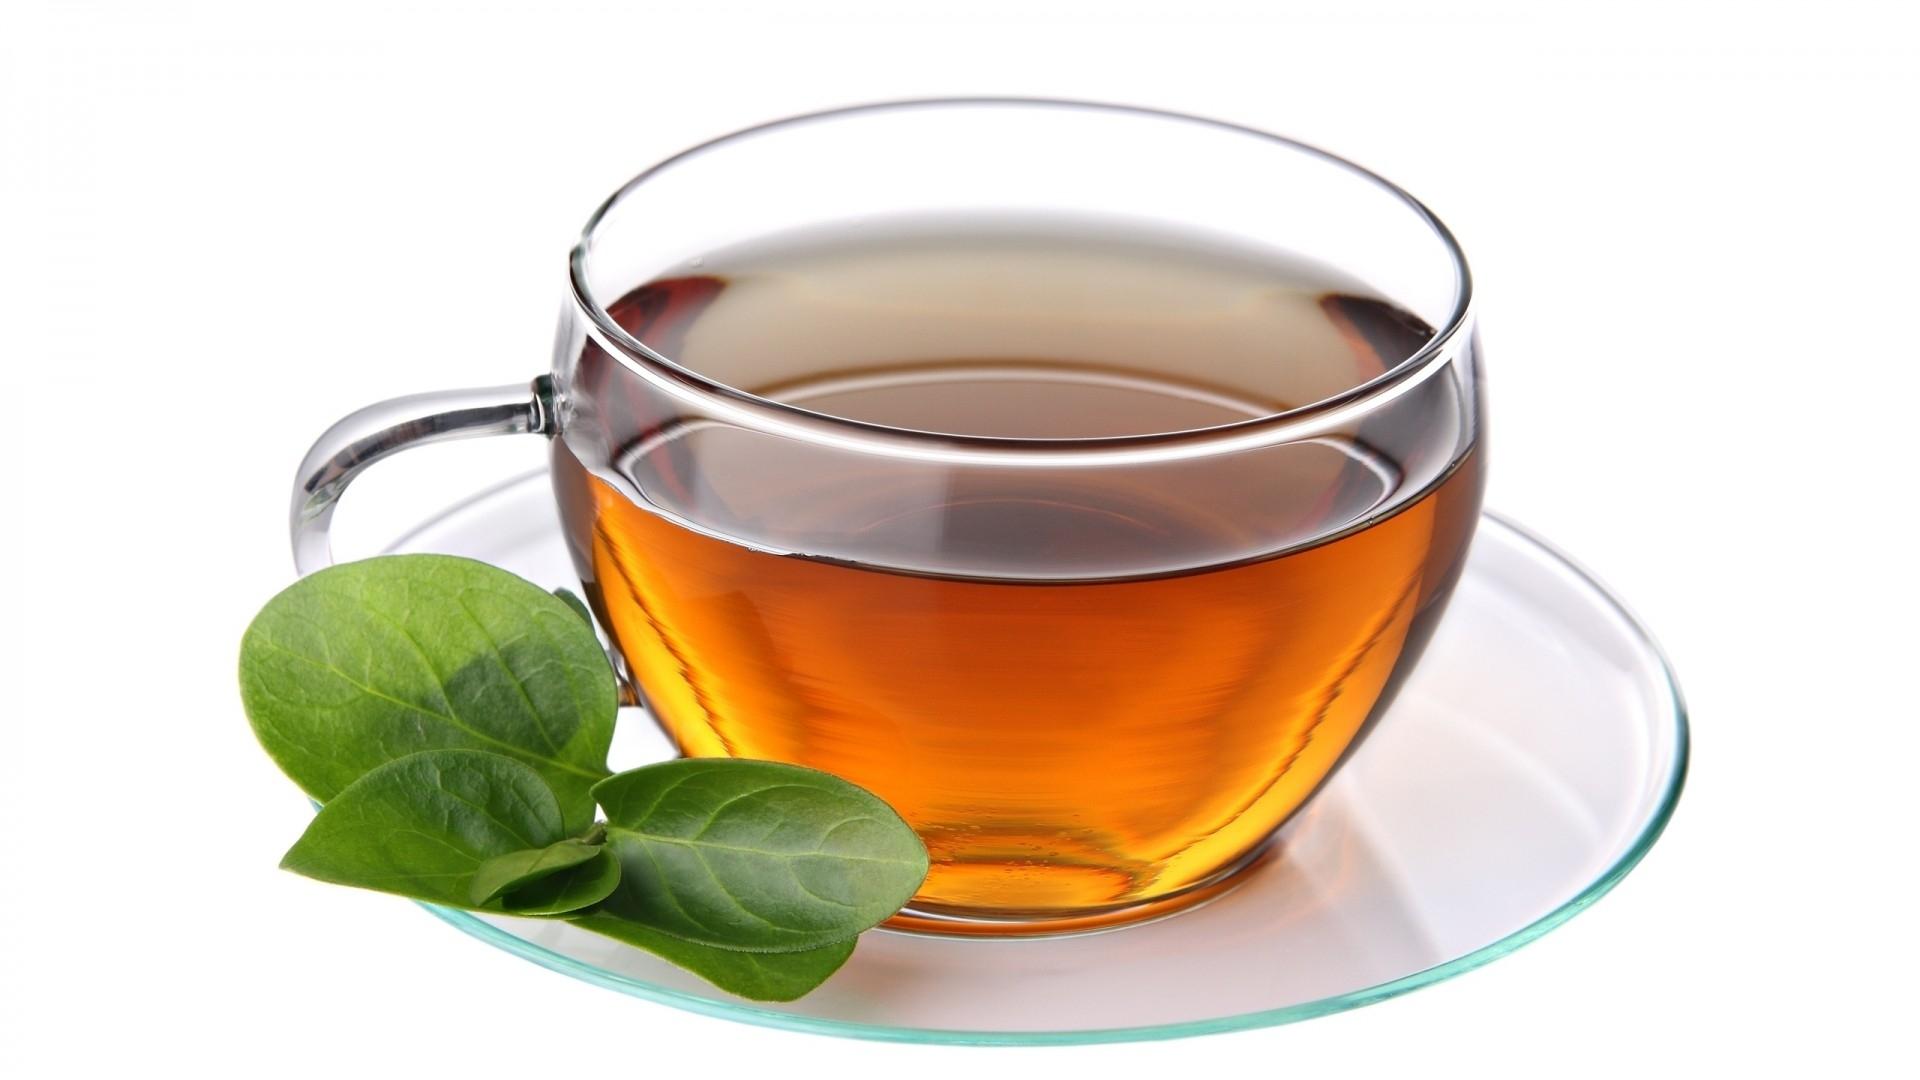 Wallpaper Tea Leaves Plate Cup 1920x1080 Goodfon 1023424 Hd Wallpapers Wallhere